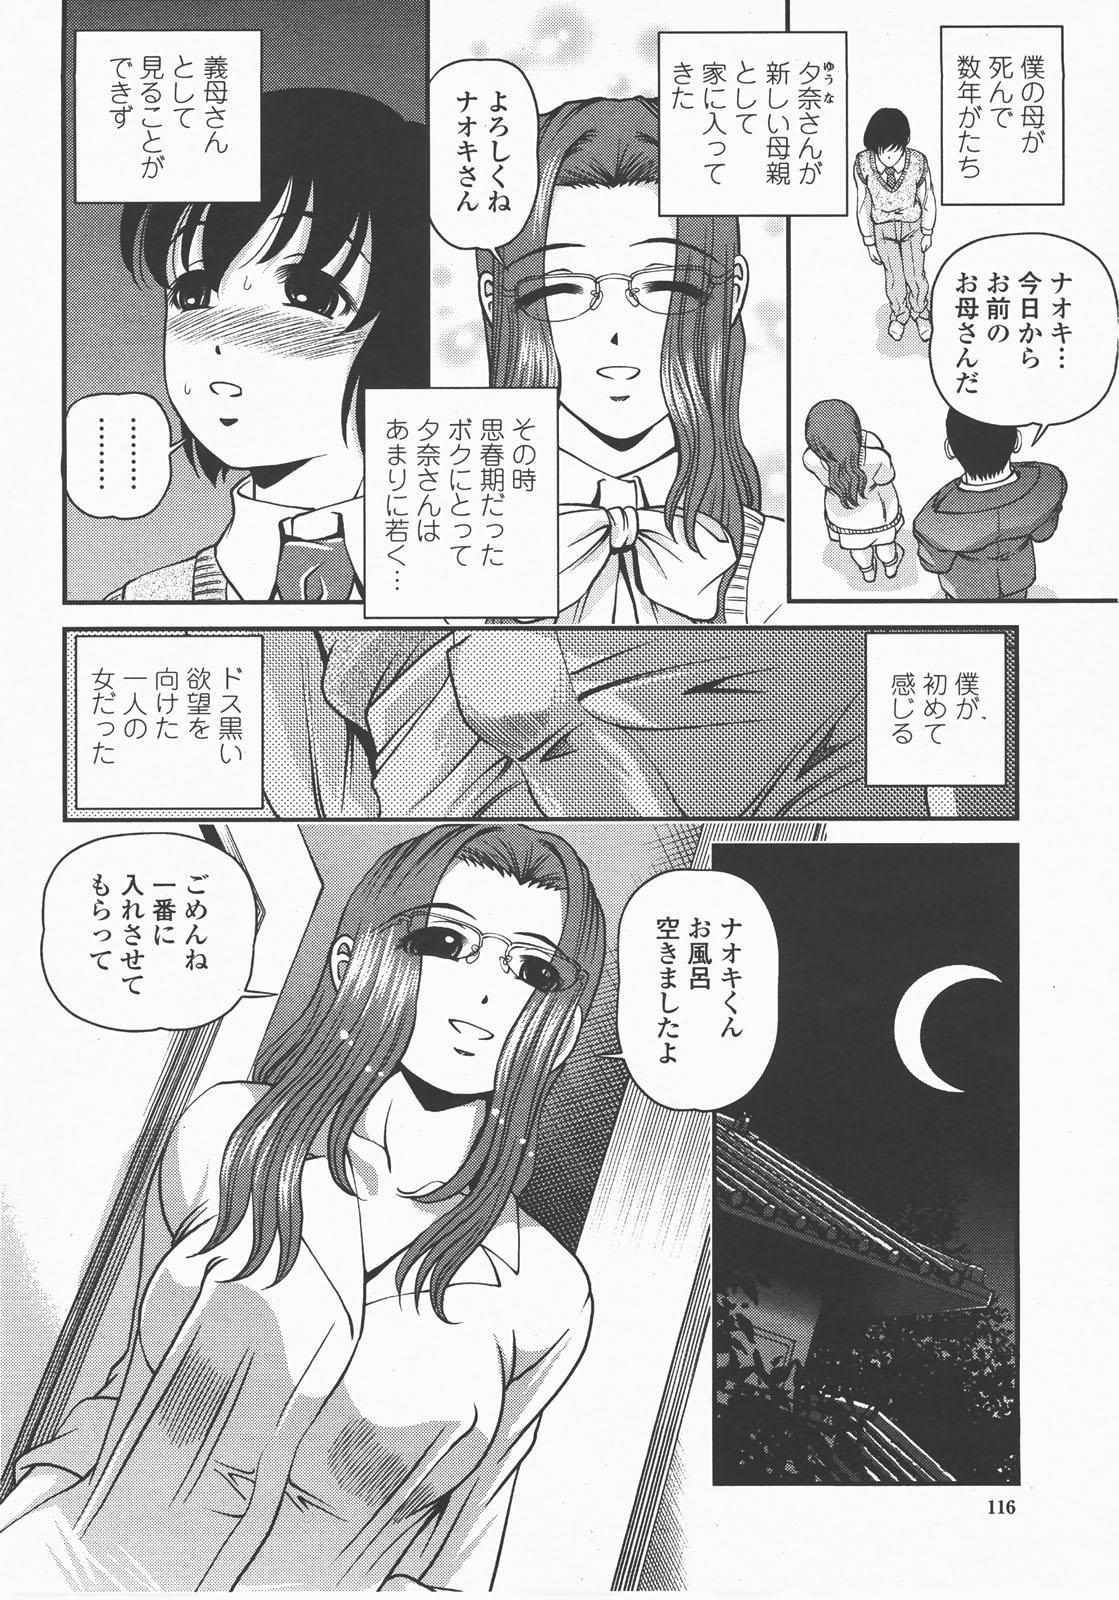 COMIC Momohime 2007-12 118